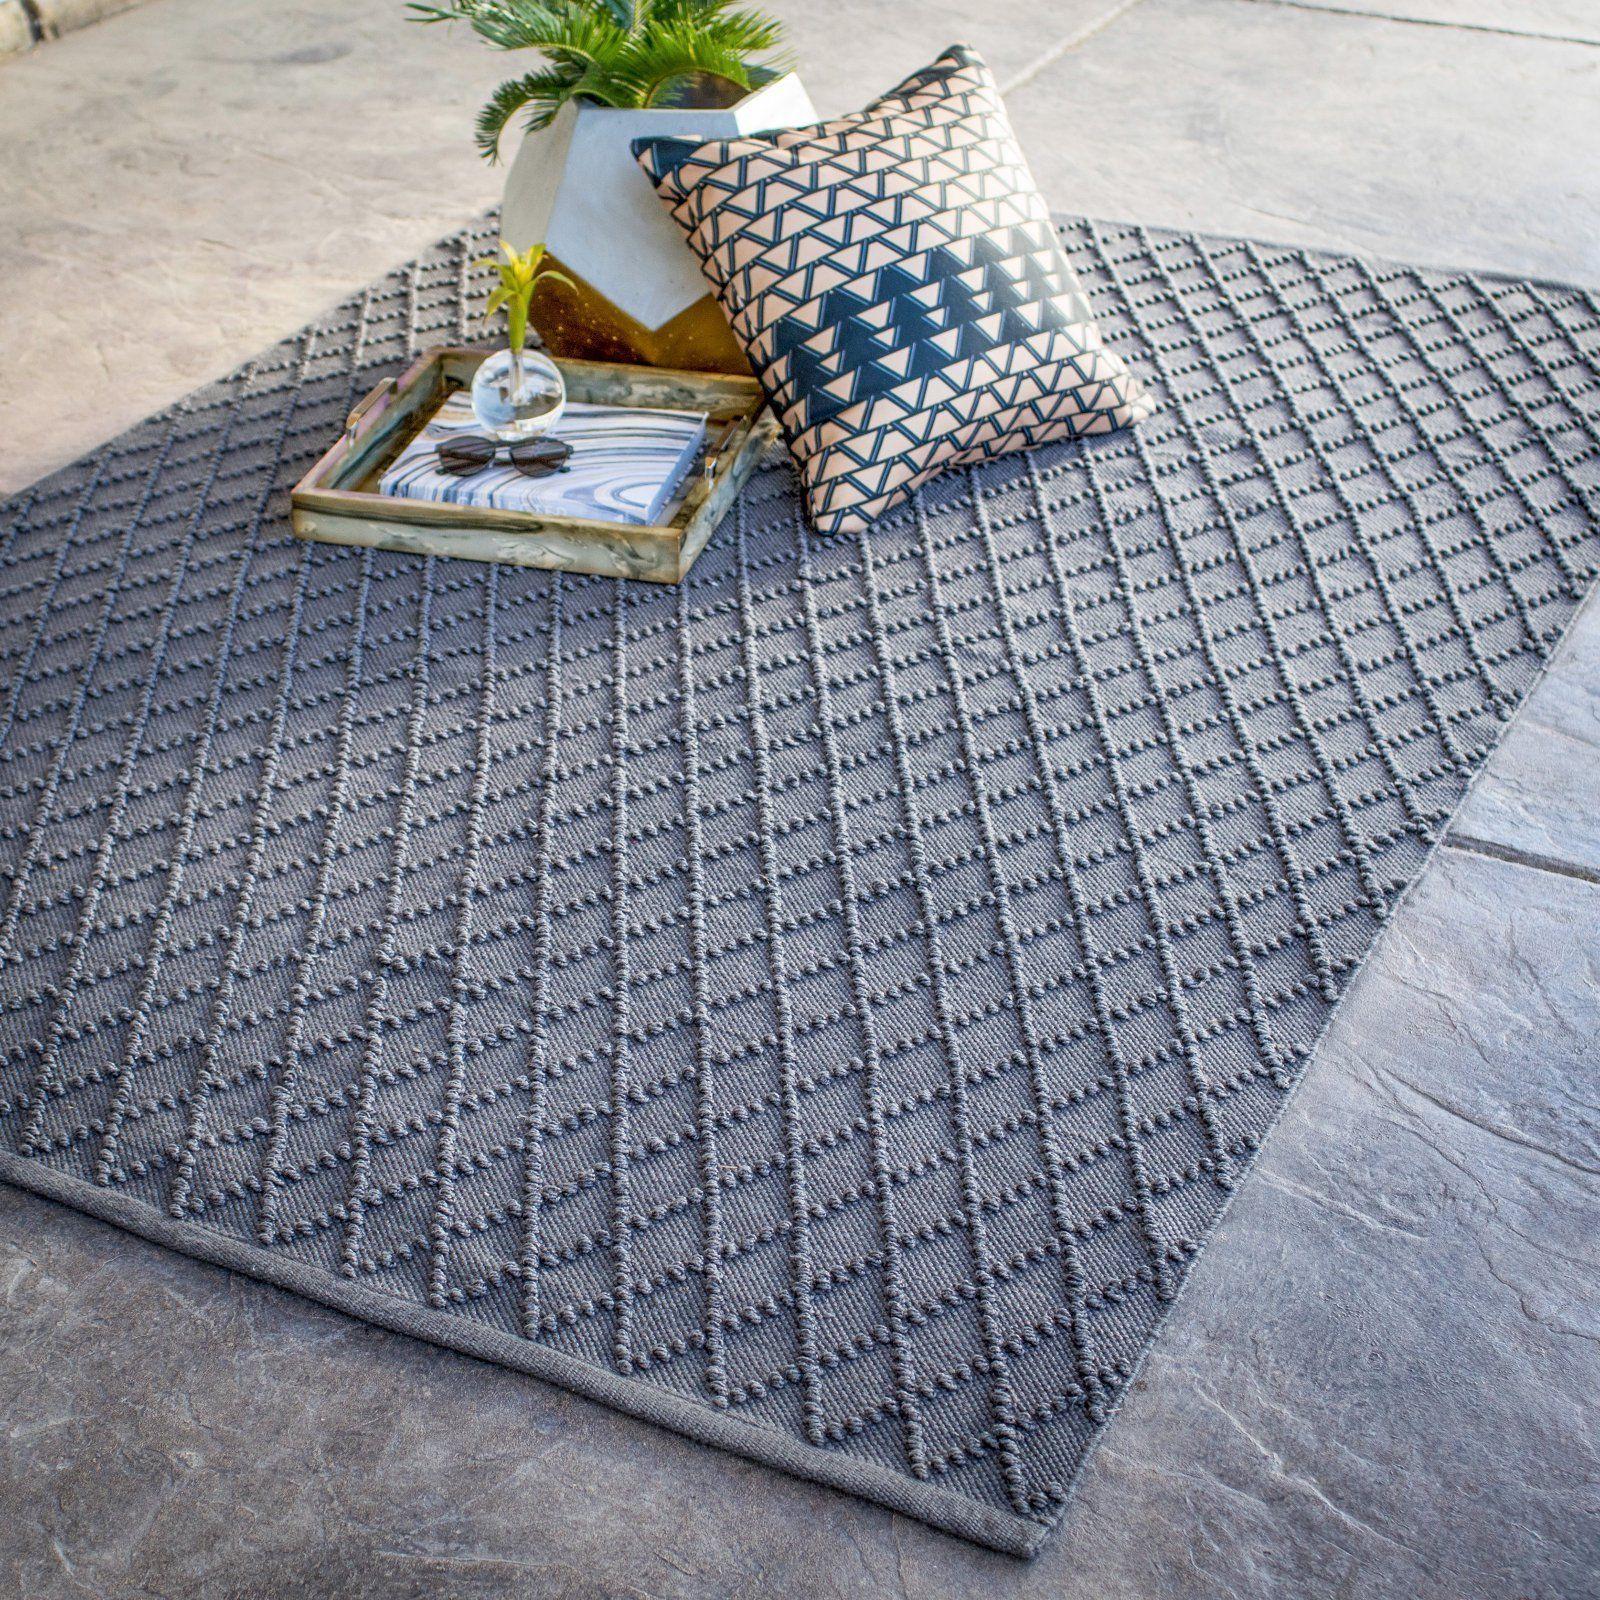 Outdoor Pool Area Rugs: Textured Diamond Modern Gray Outdoor Area Rug Pool Patio 3